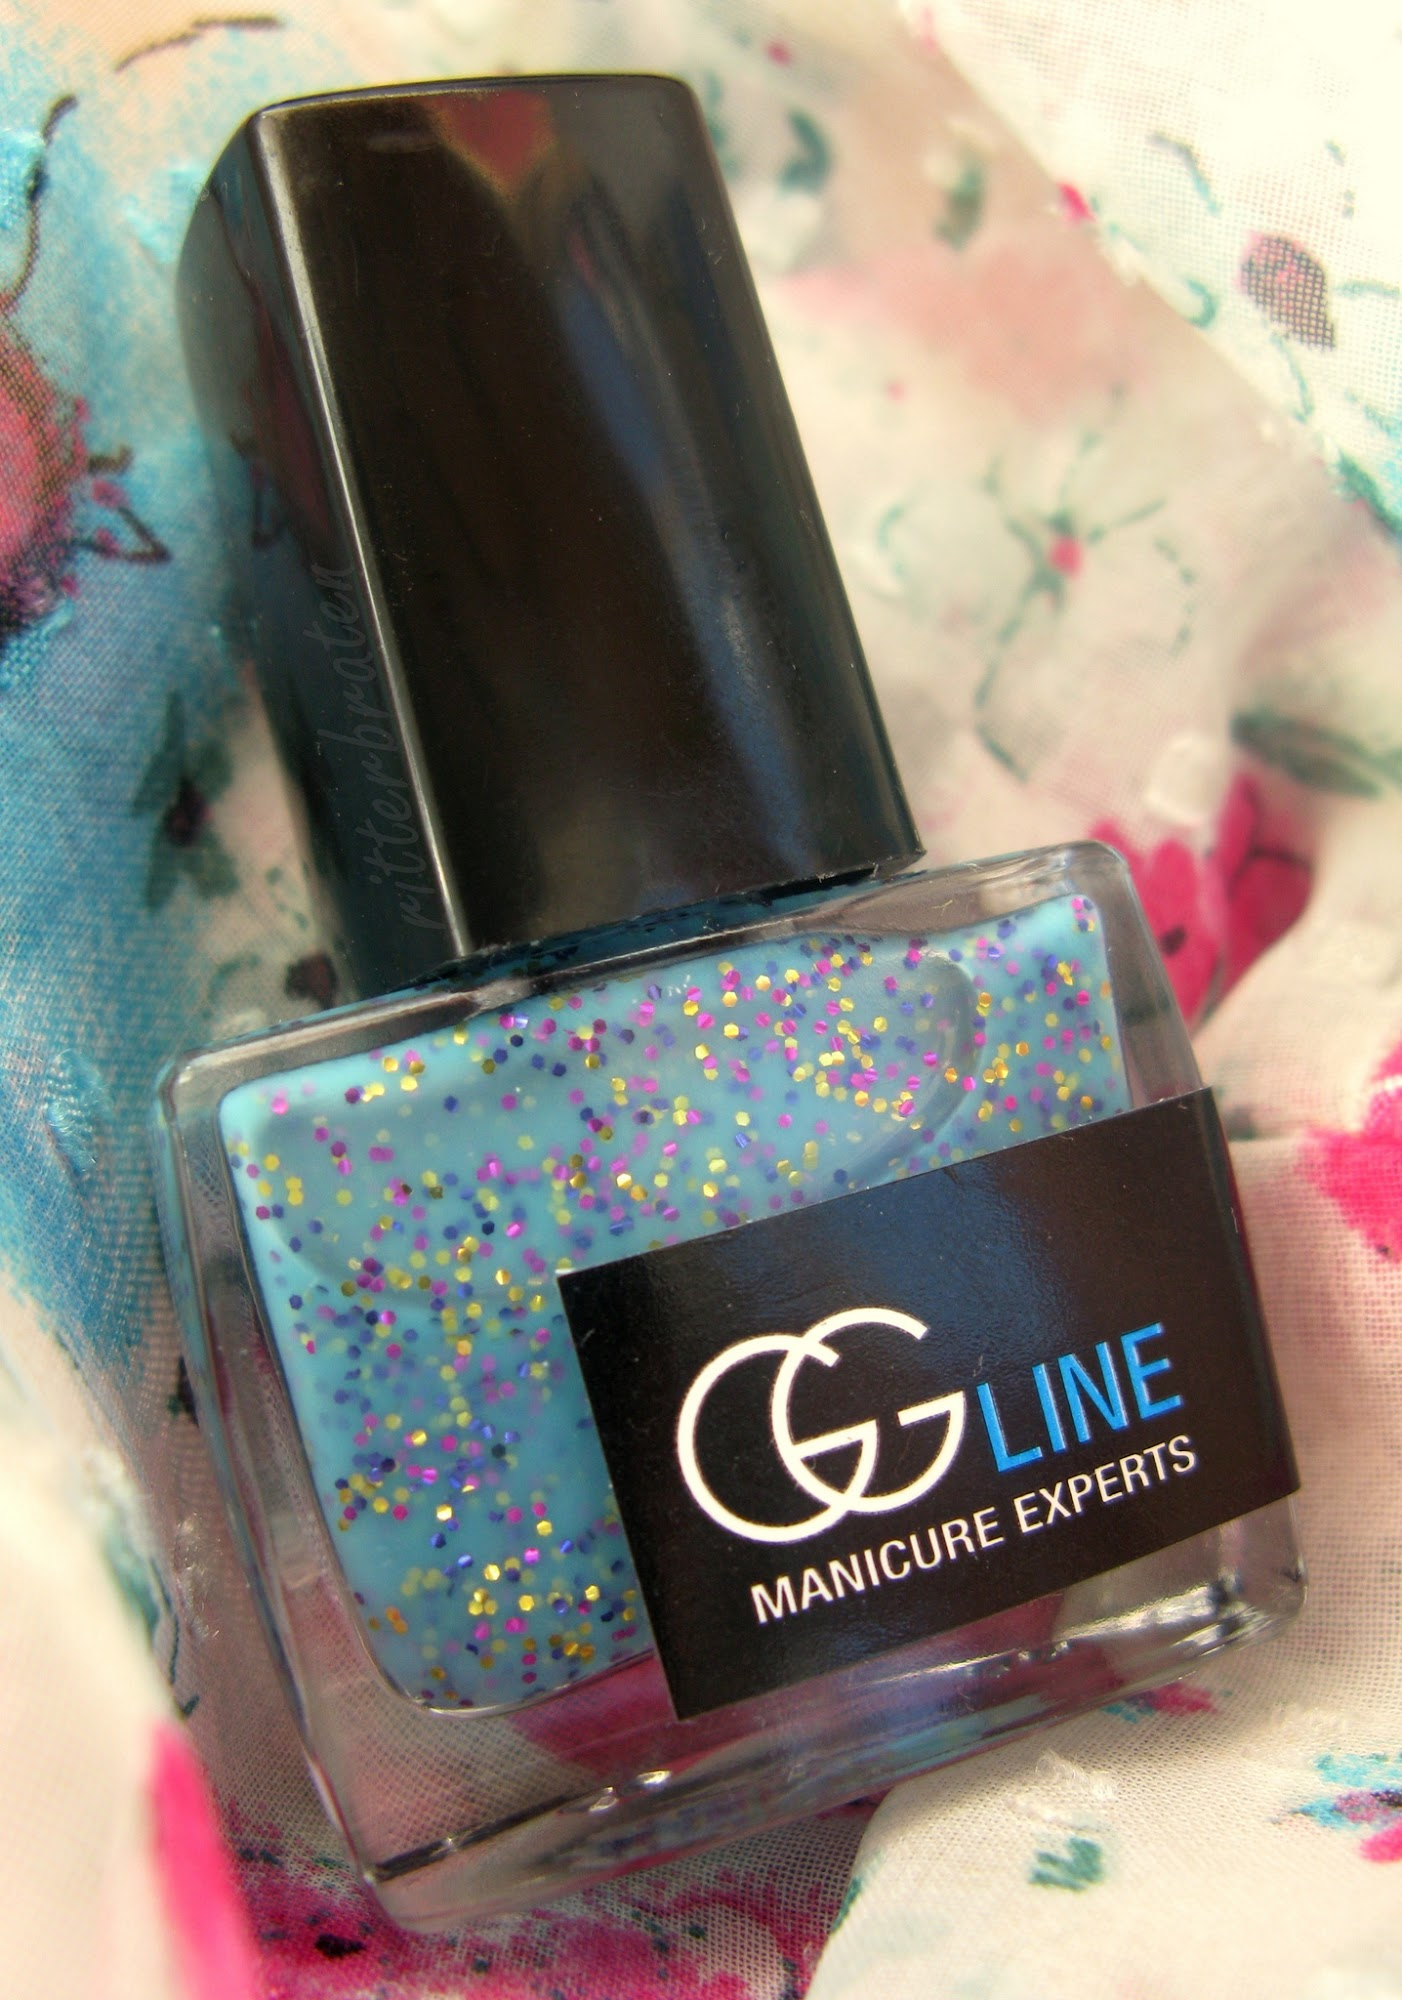 gg line manicure